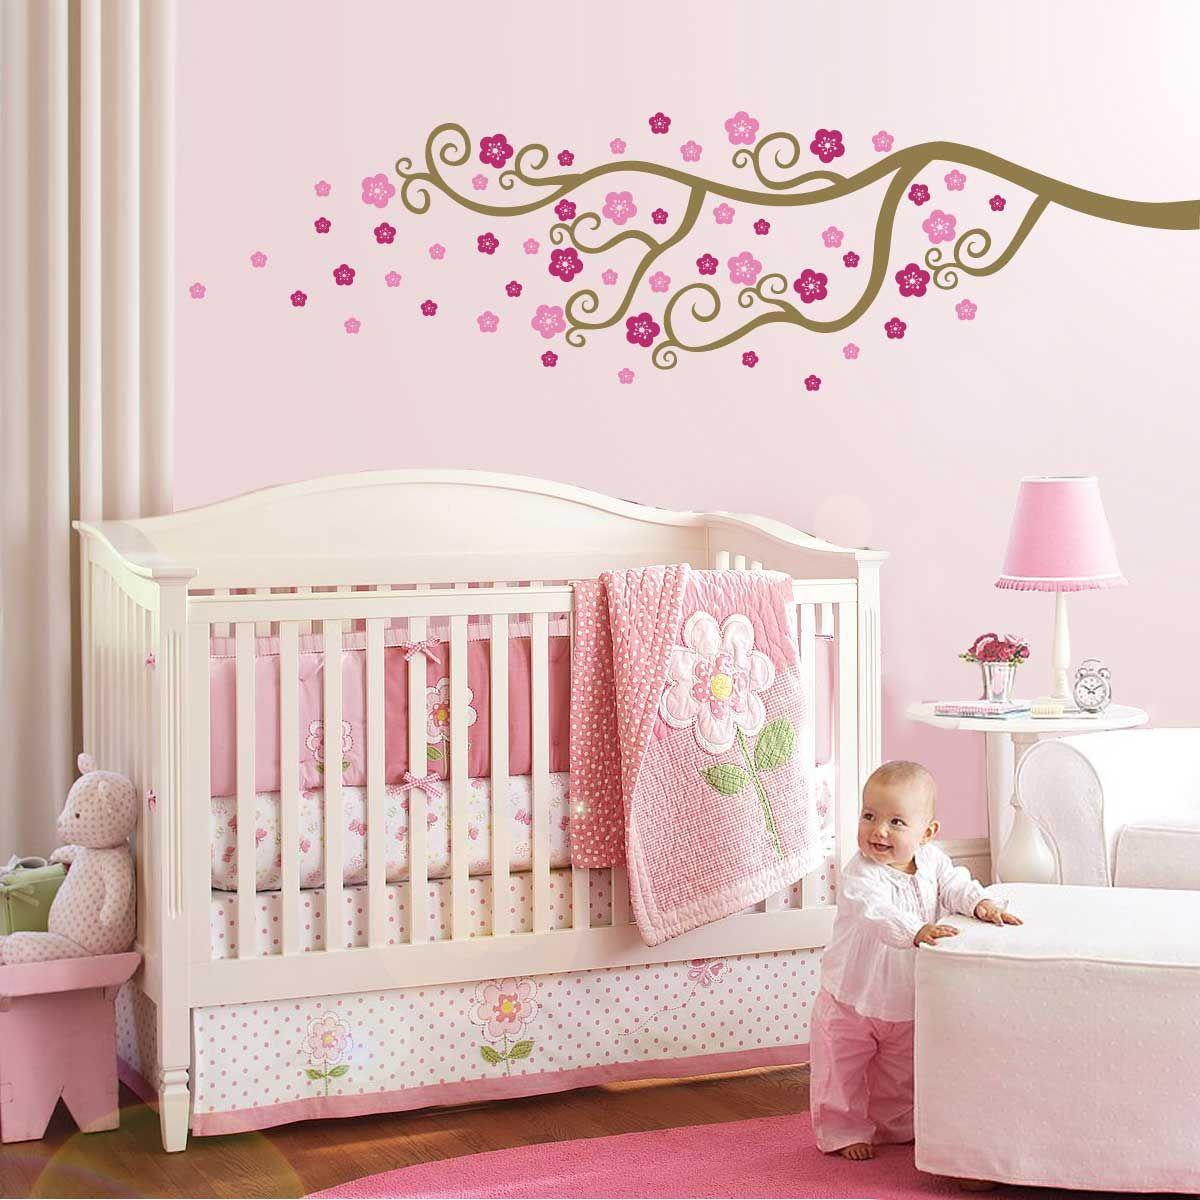 Best Kitchen Gallery: Pink Design Baby Room Ideas ღby Mildz Christer Belgaღ of Baby Rooms Designs  on rachelxblog.com